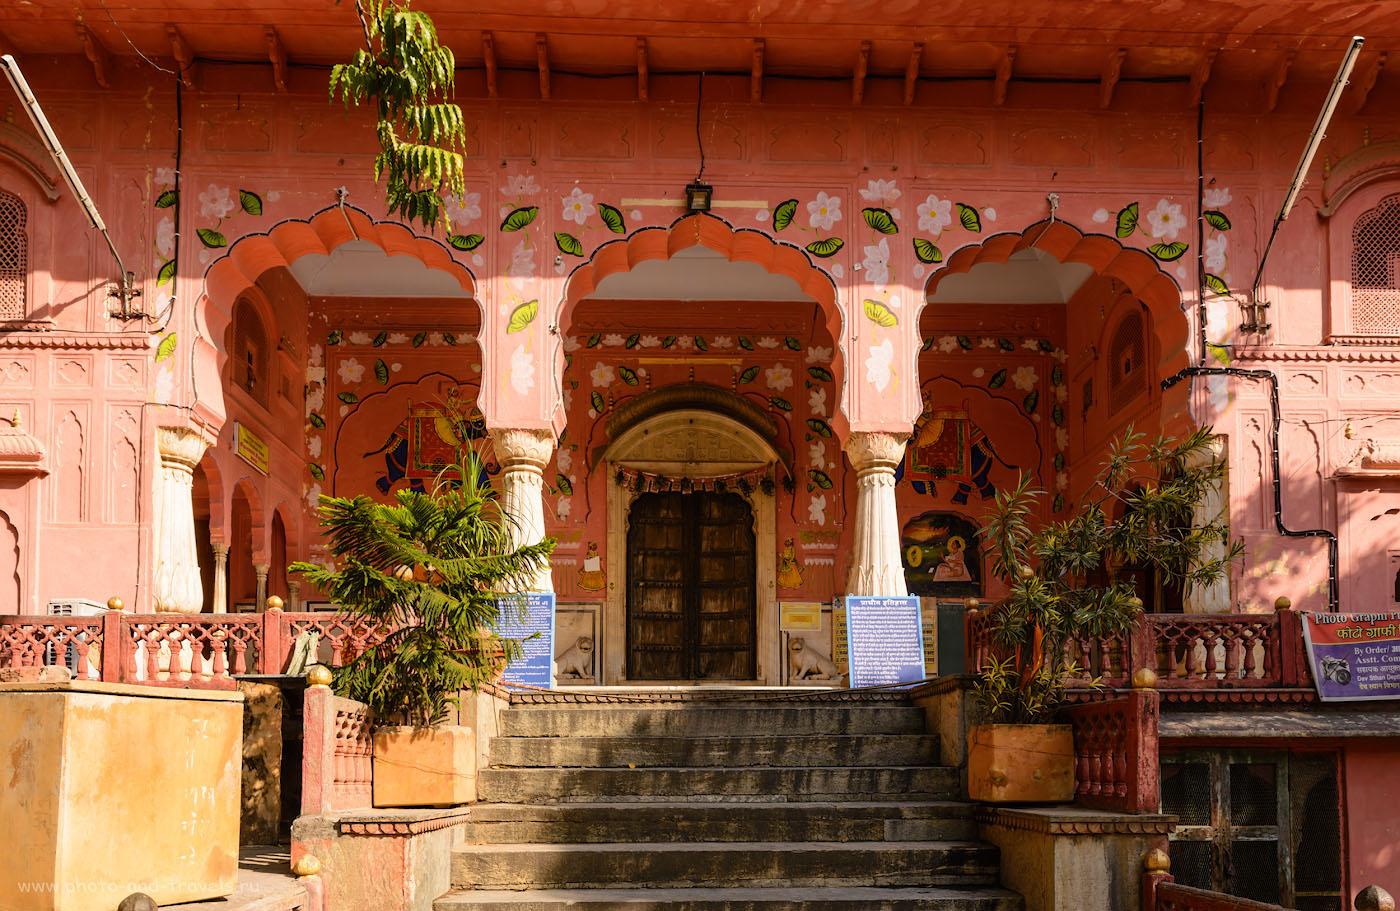 Фото 7. На заднем дворе дворца Хава-Махал. Экскурсии по Джайпуру дикарями. 1/80, 11.0, 100, 24.